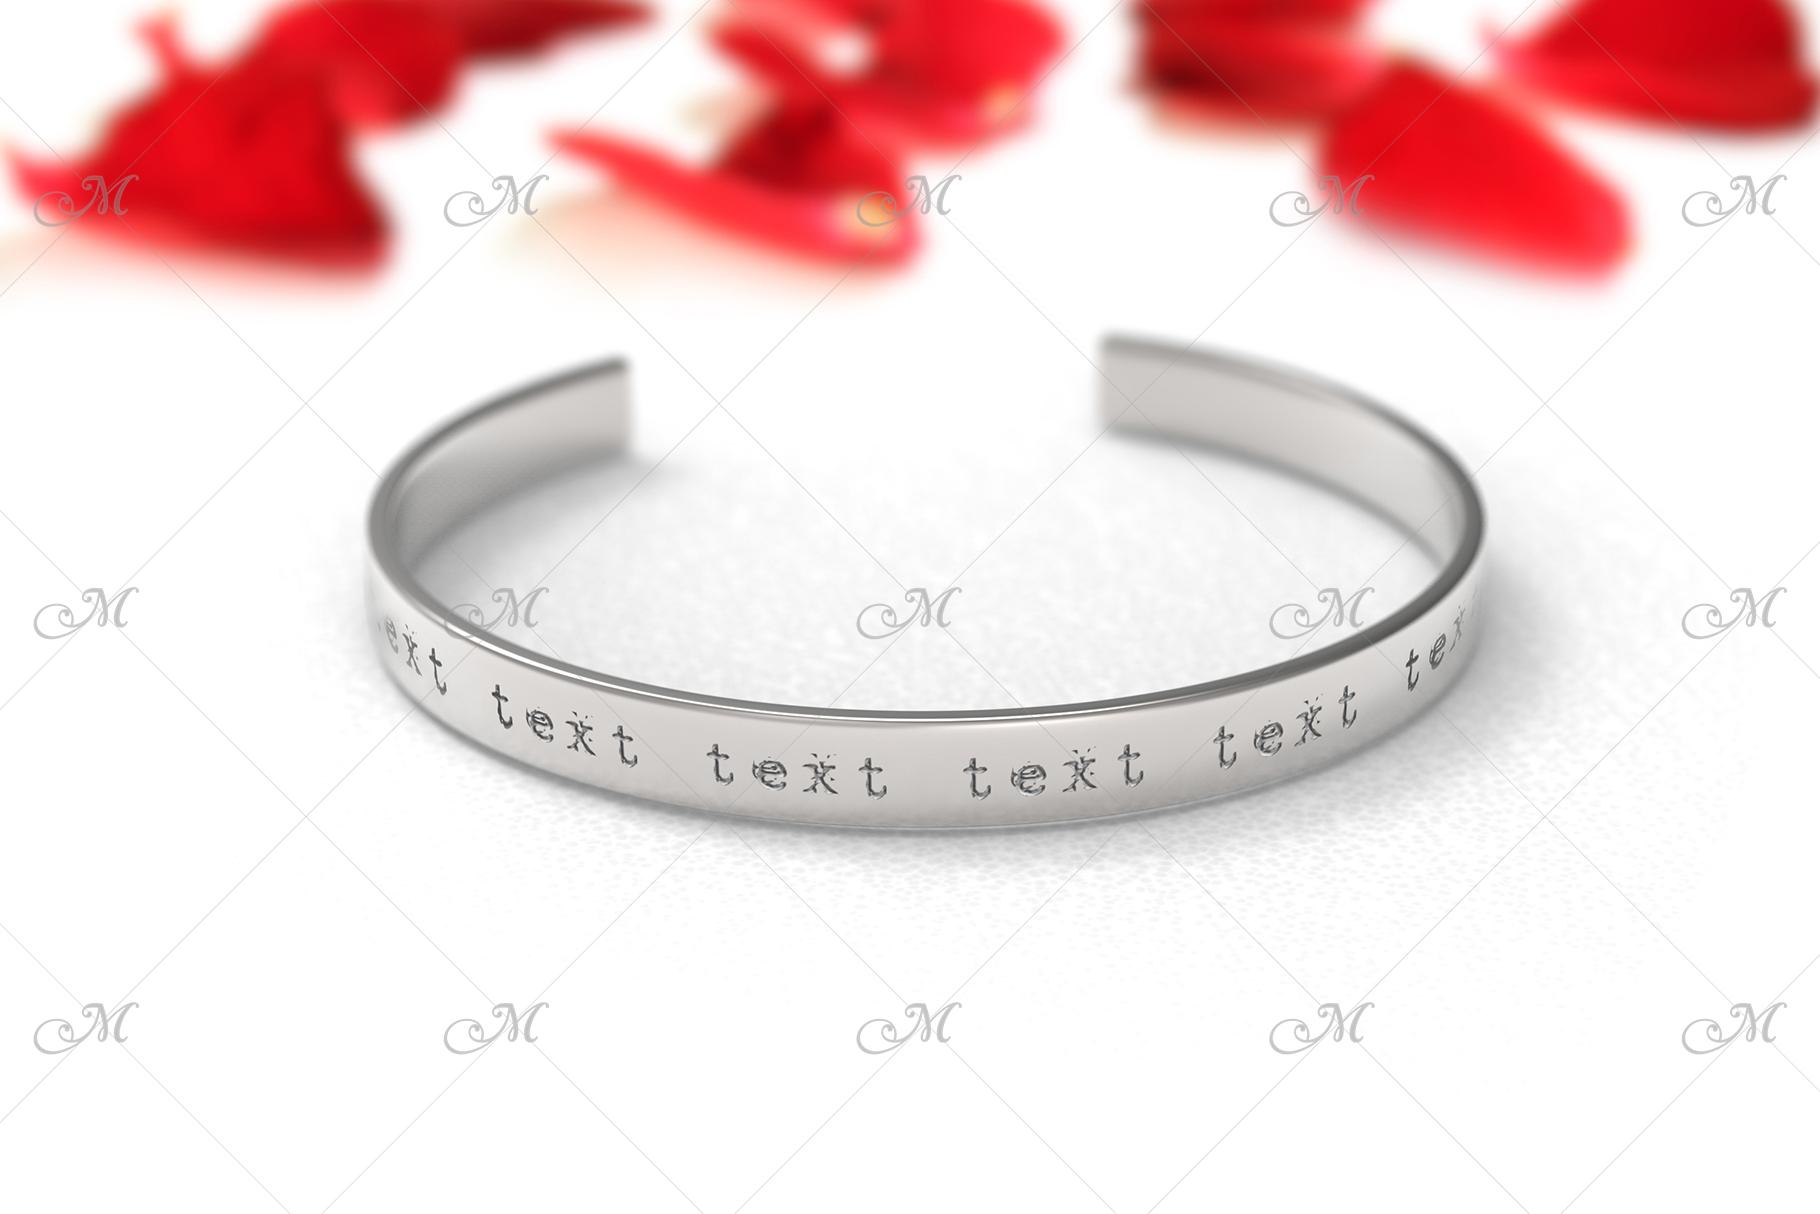 Metal Bracelet Mock-up. PSD & JPG example image 3